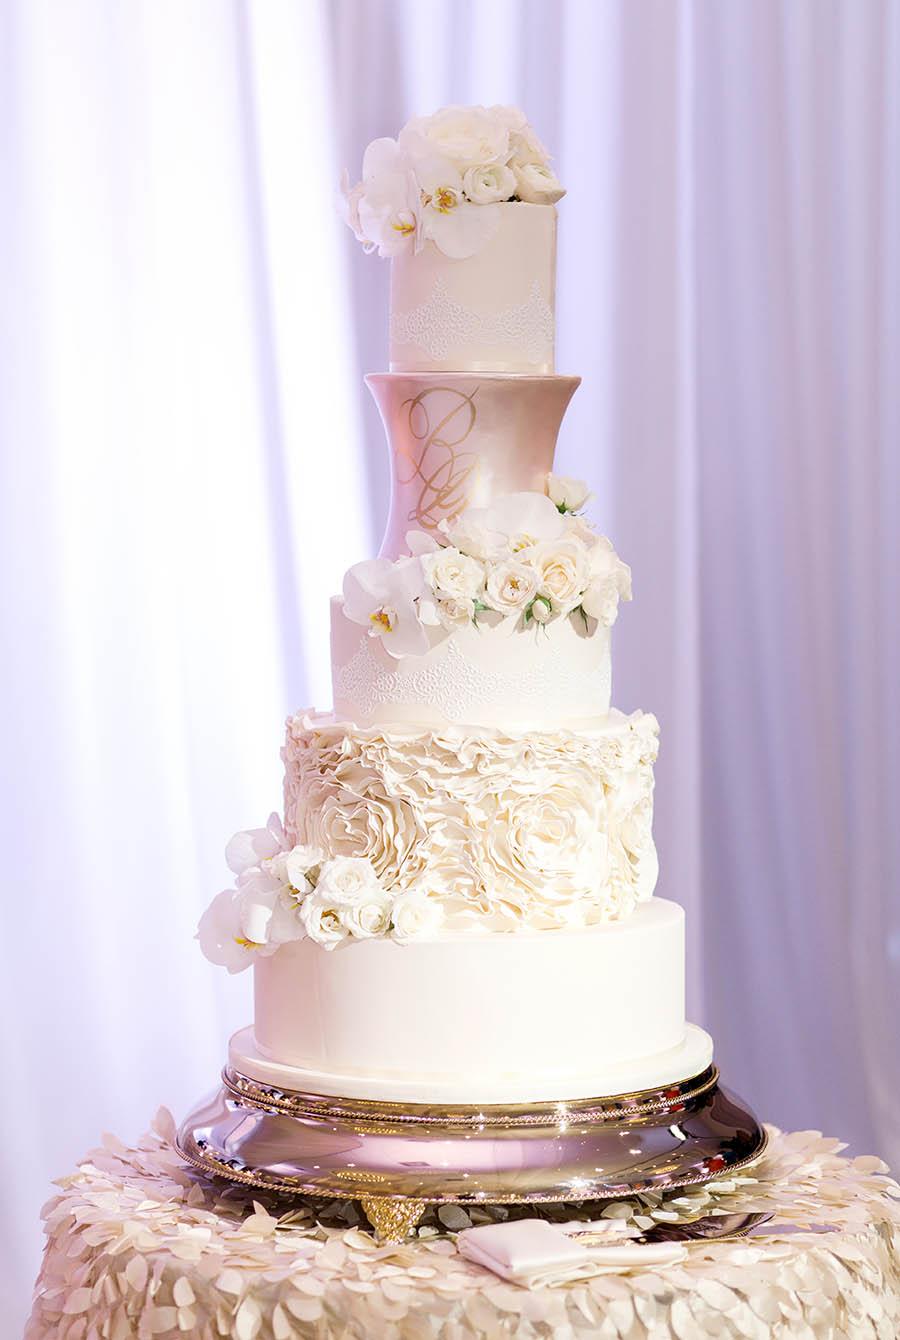 Miami wedding cakes miamis best custom wedding cakes 2018 best wedding cakes in miami junglespirit Gallery